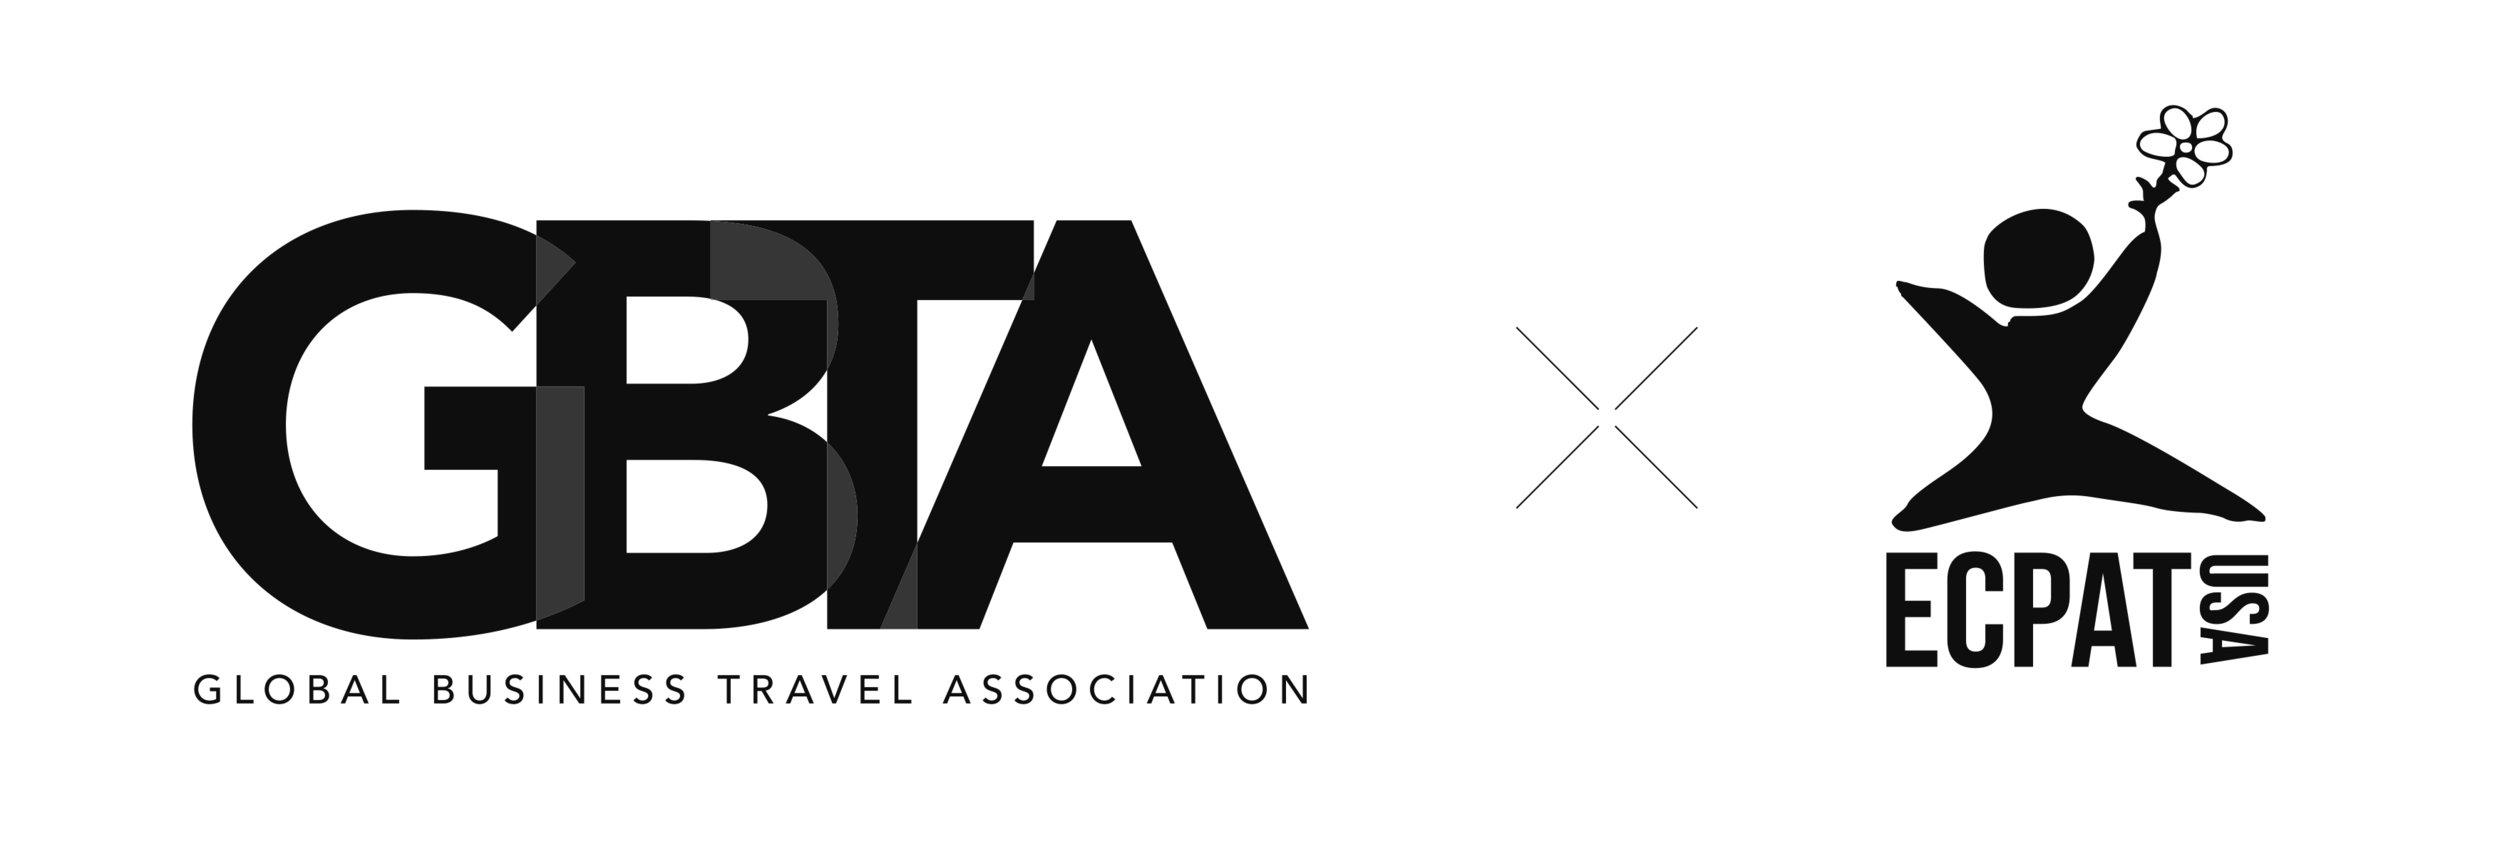 gbta-ecpatusa-final-approved.jpg